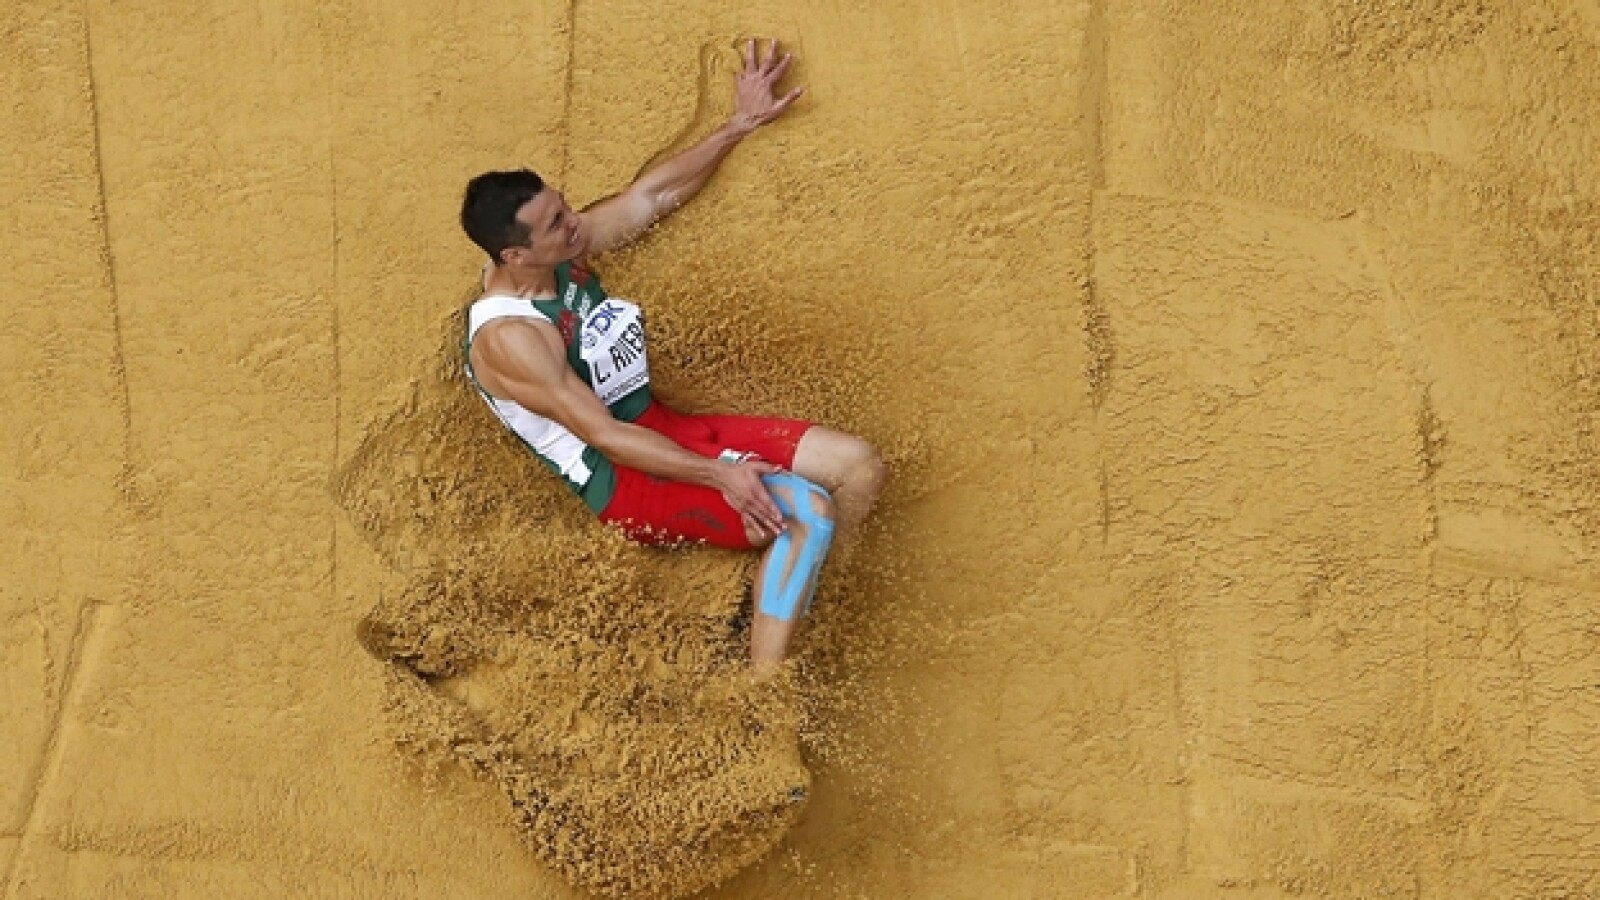 Luis Rivera medalla bronce Mundial de Atletismo Moscu 2013